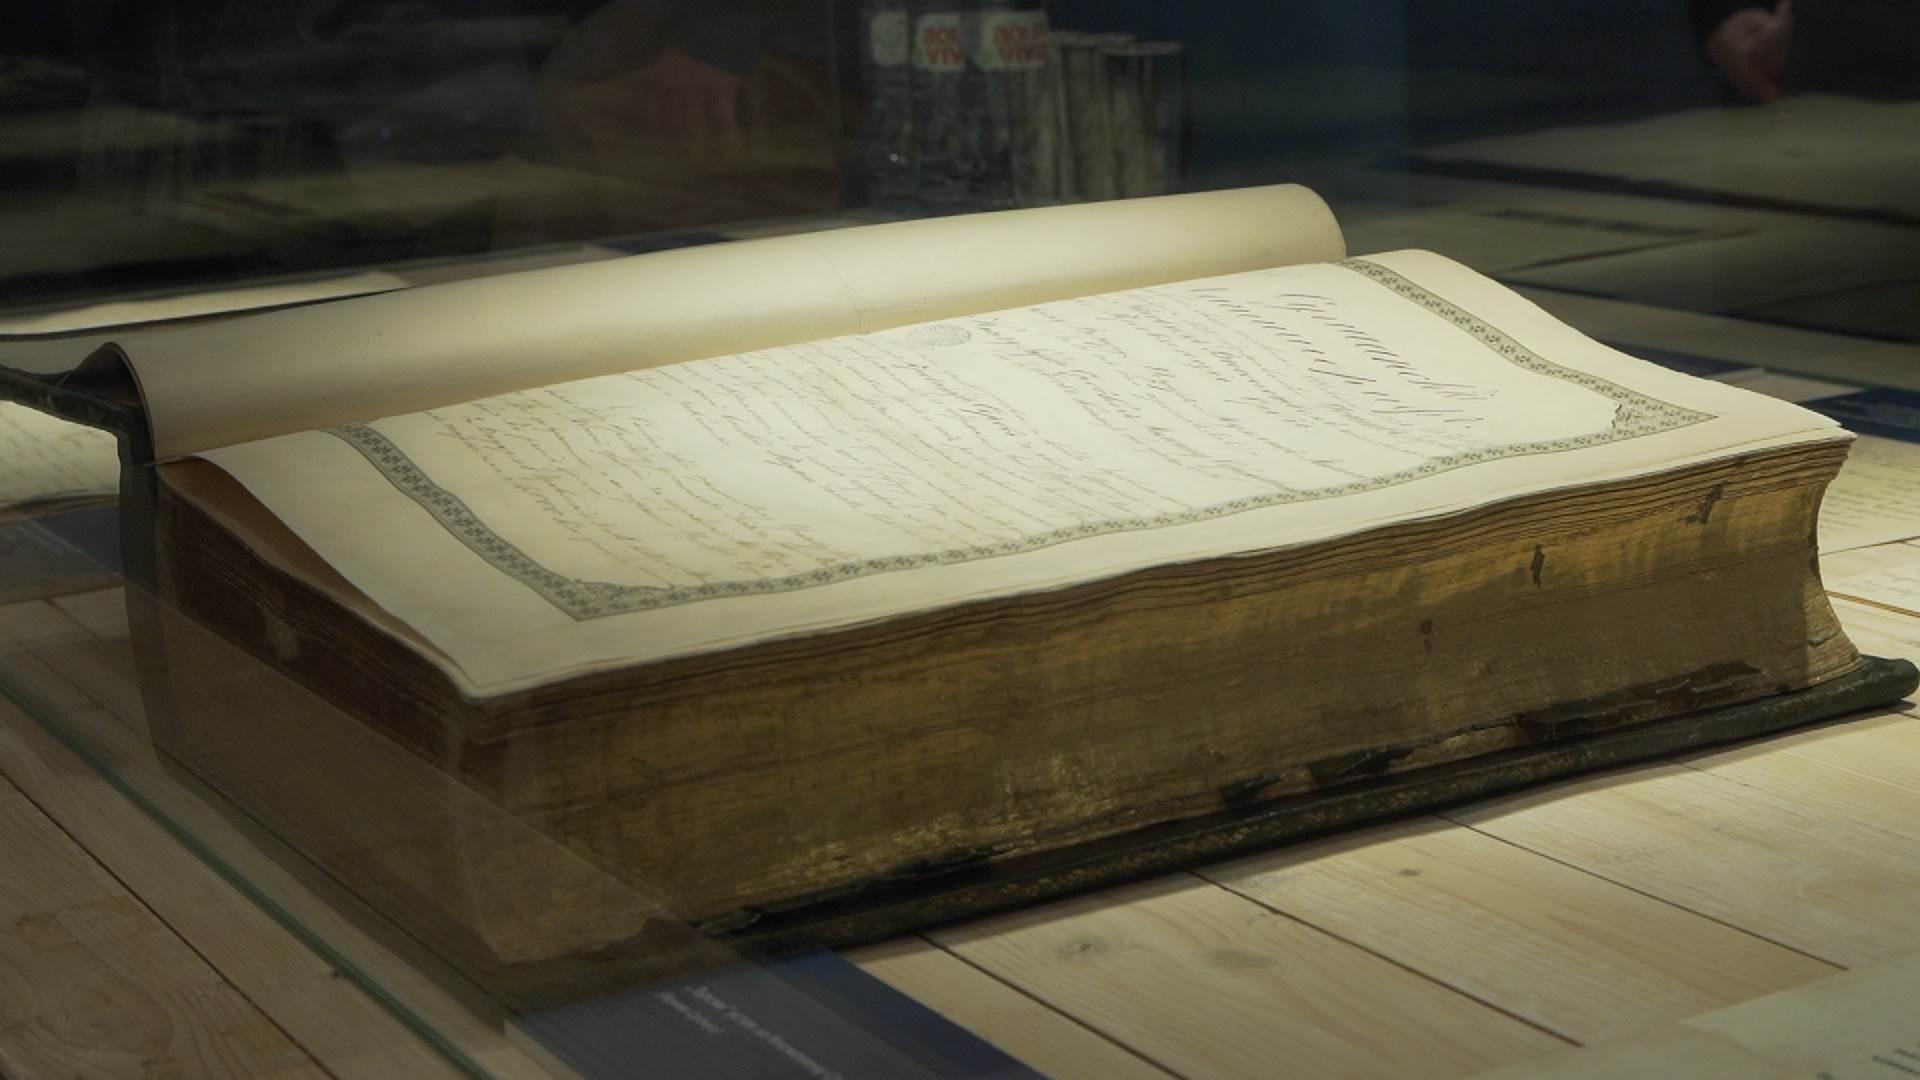 arhiv, istorija, istorijska građa, arhivska građa, knjiga